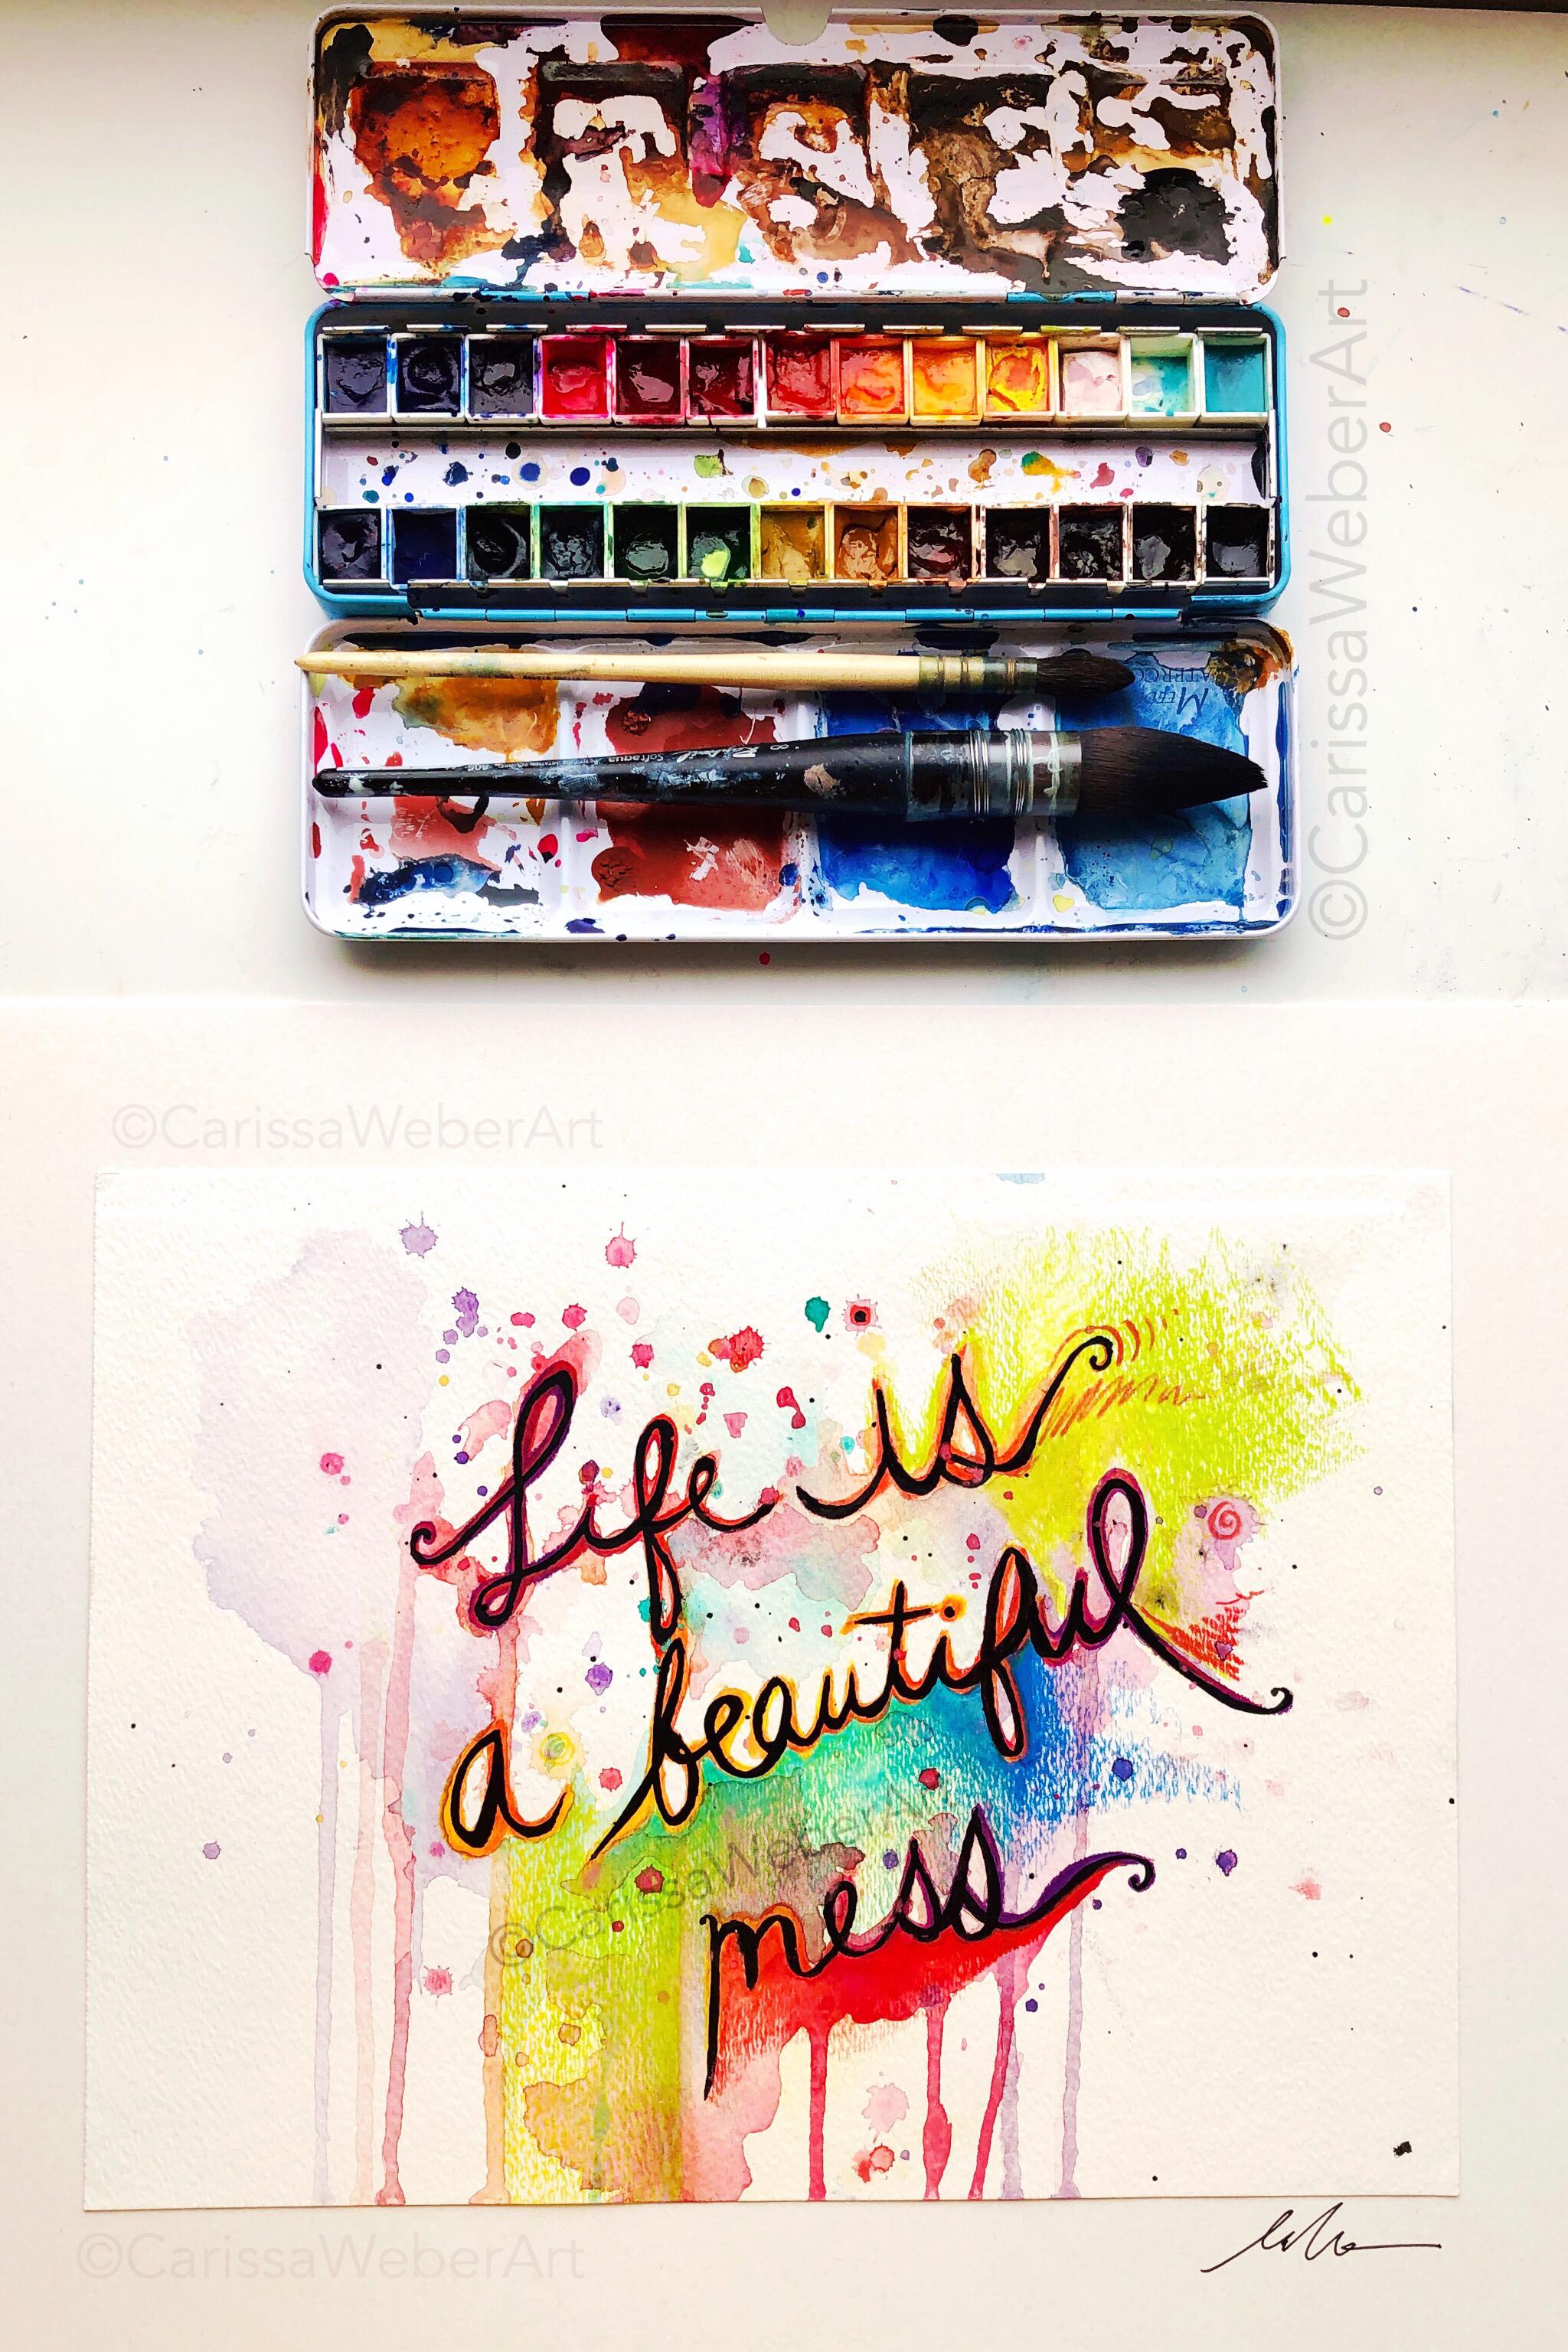 Arti Mess : Beautiful, ❤️, Original, Carissa, Weber, Eclectic, Artwork,, Rainbow, Colorful